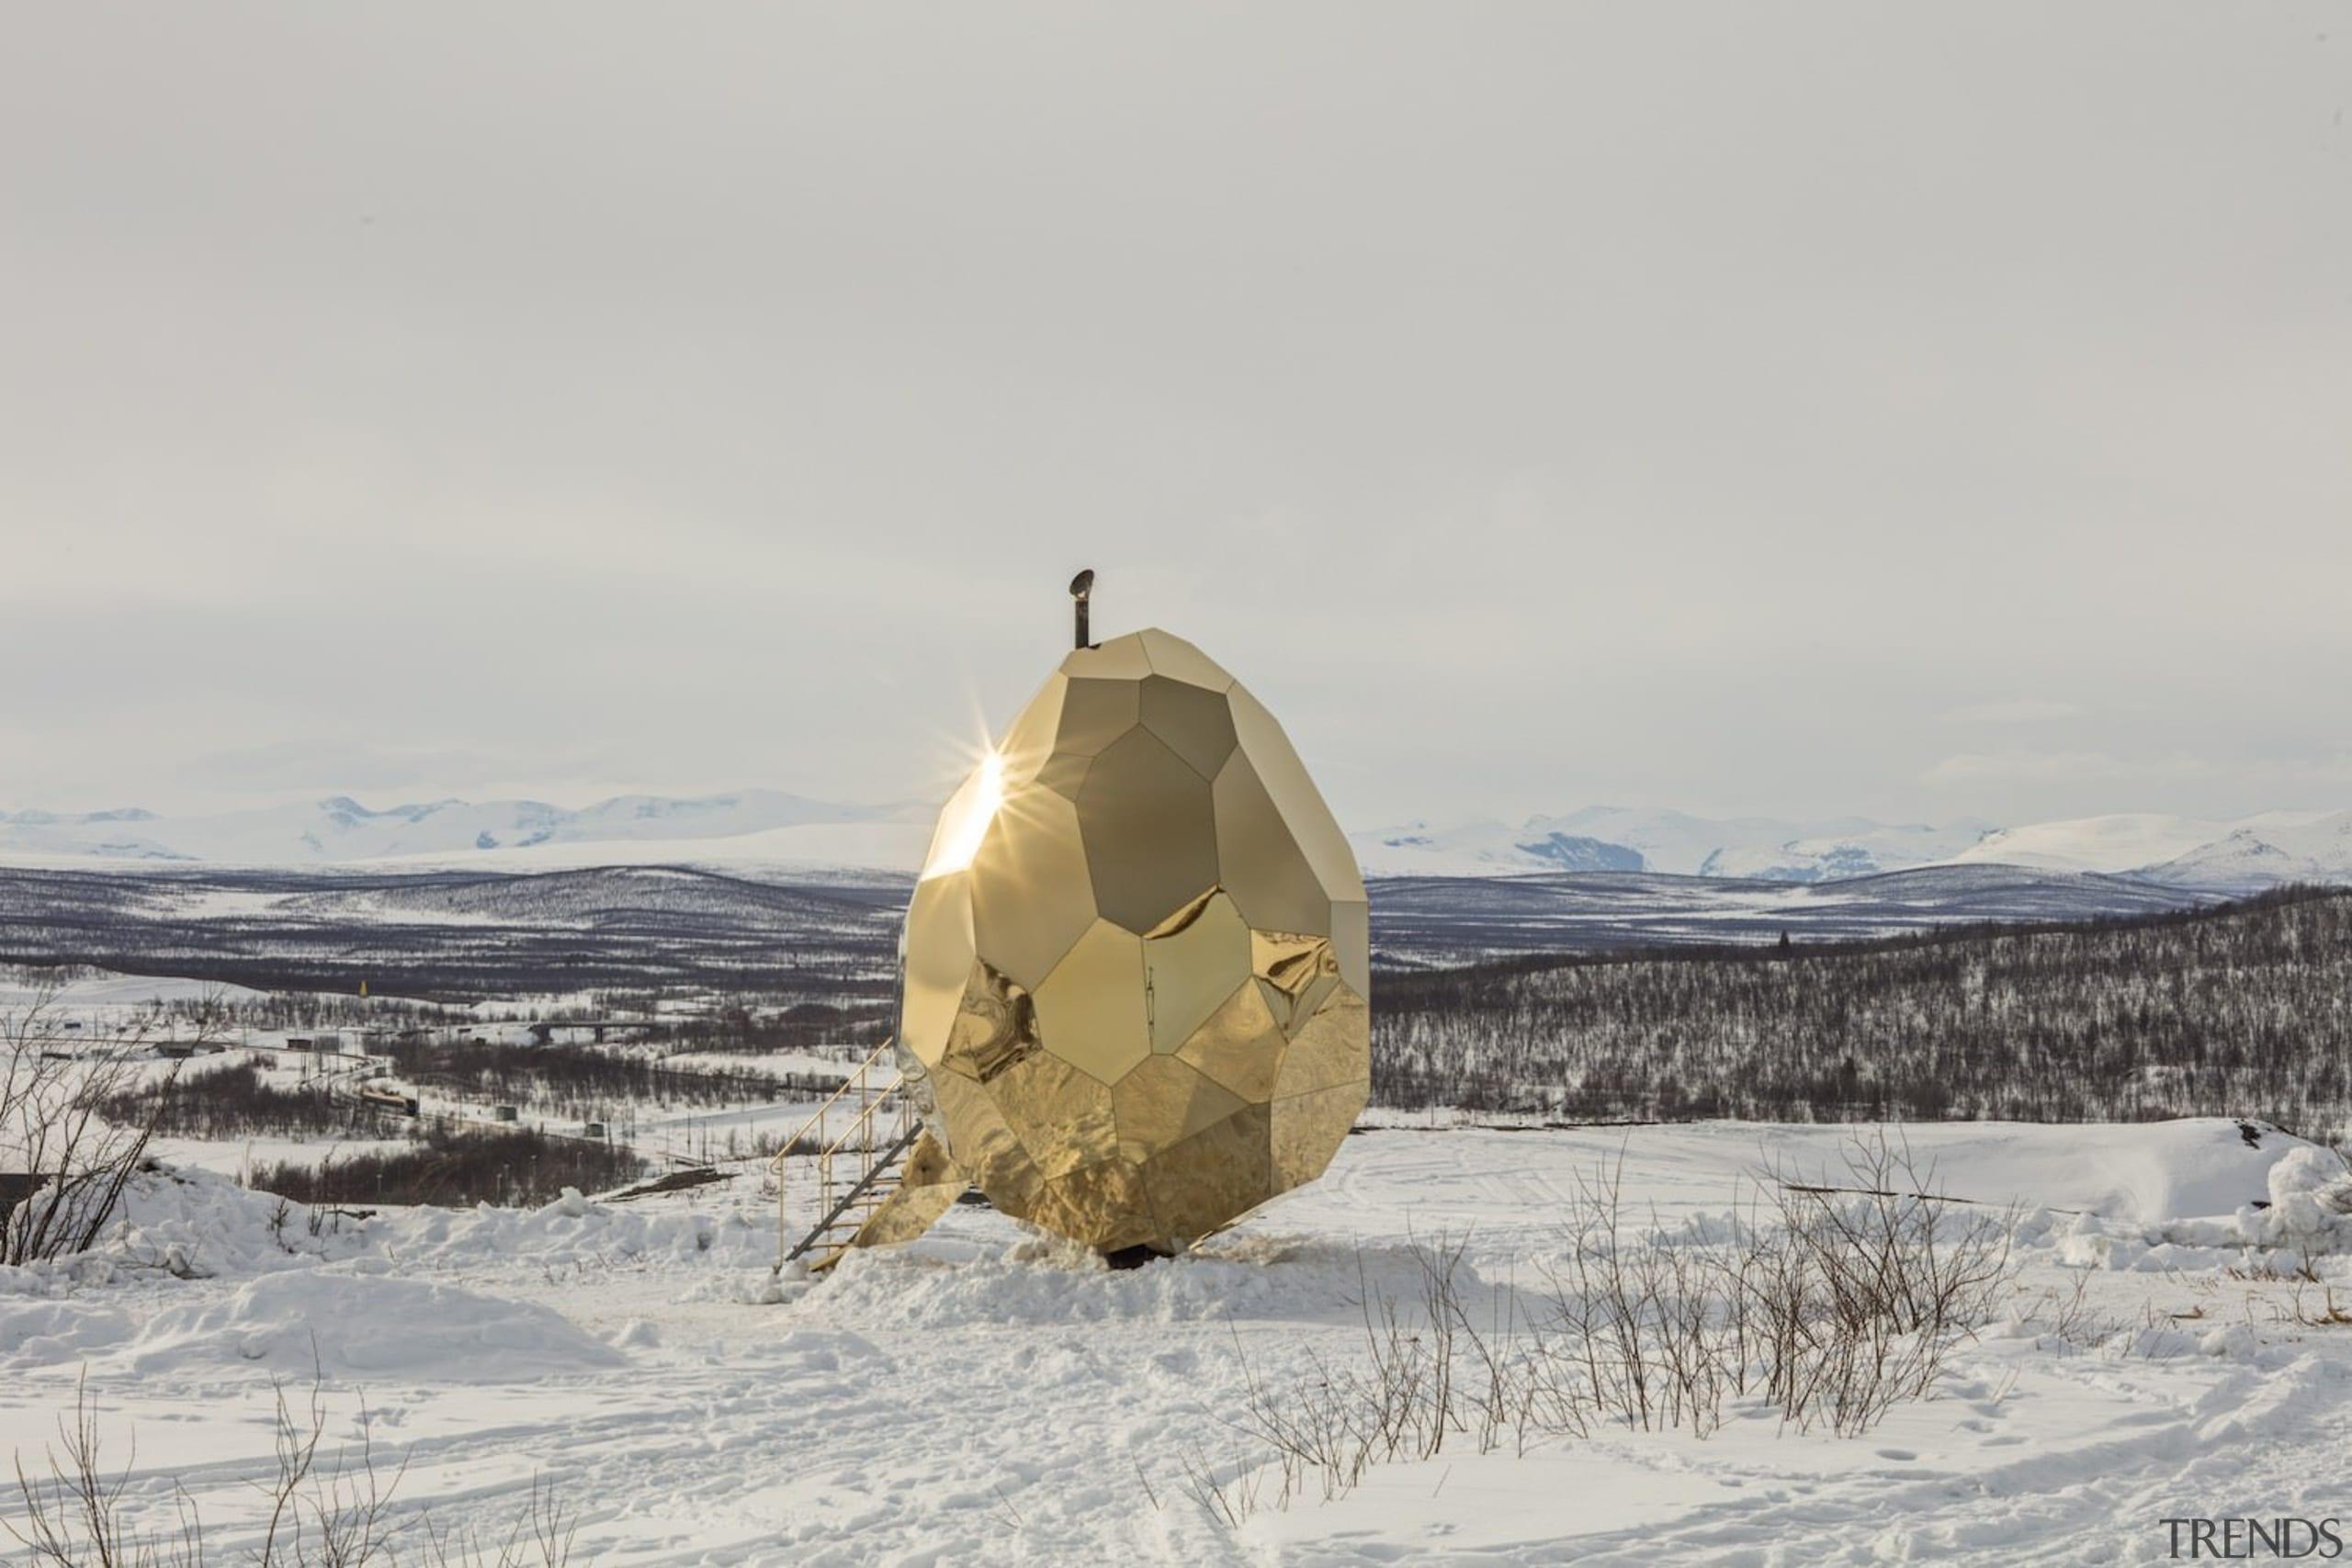 Designed by Bigert & BergströmPhotography by Jean-Baptiste arctic, freezing, ice, sky, snow, tundra, winter, gray